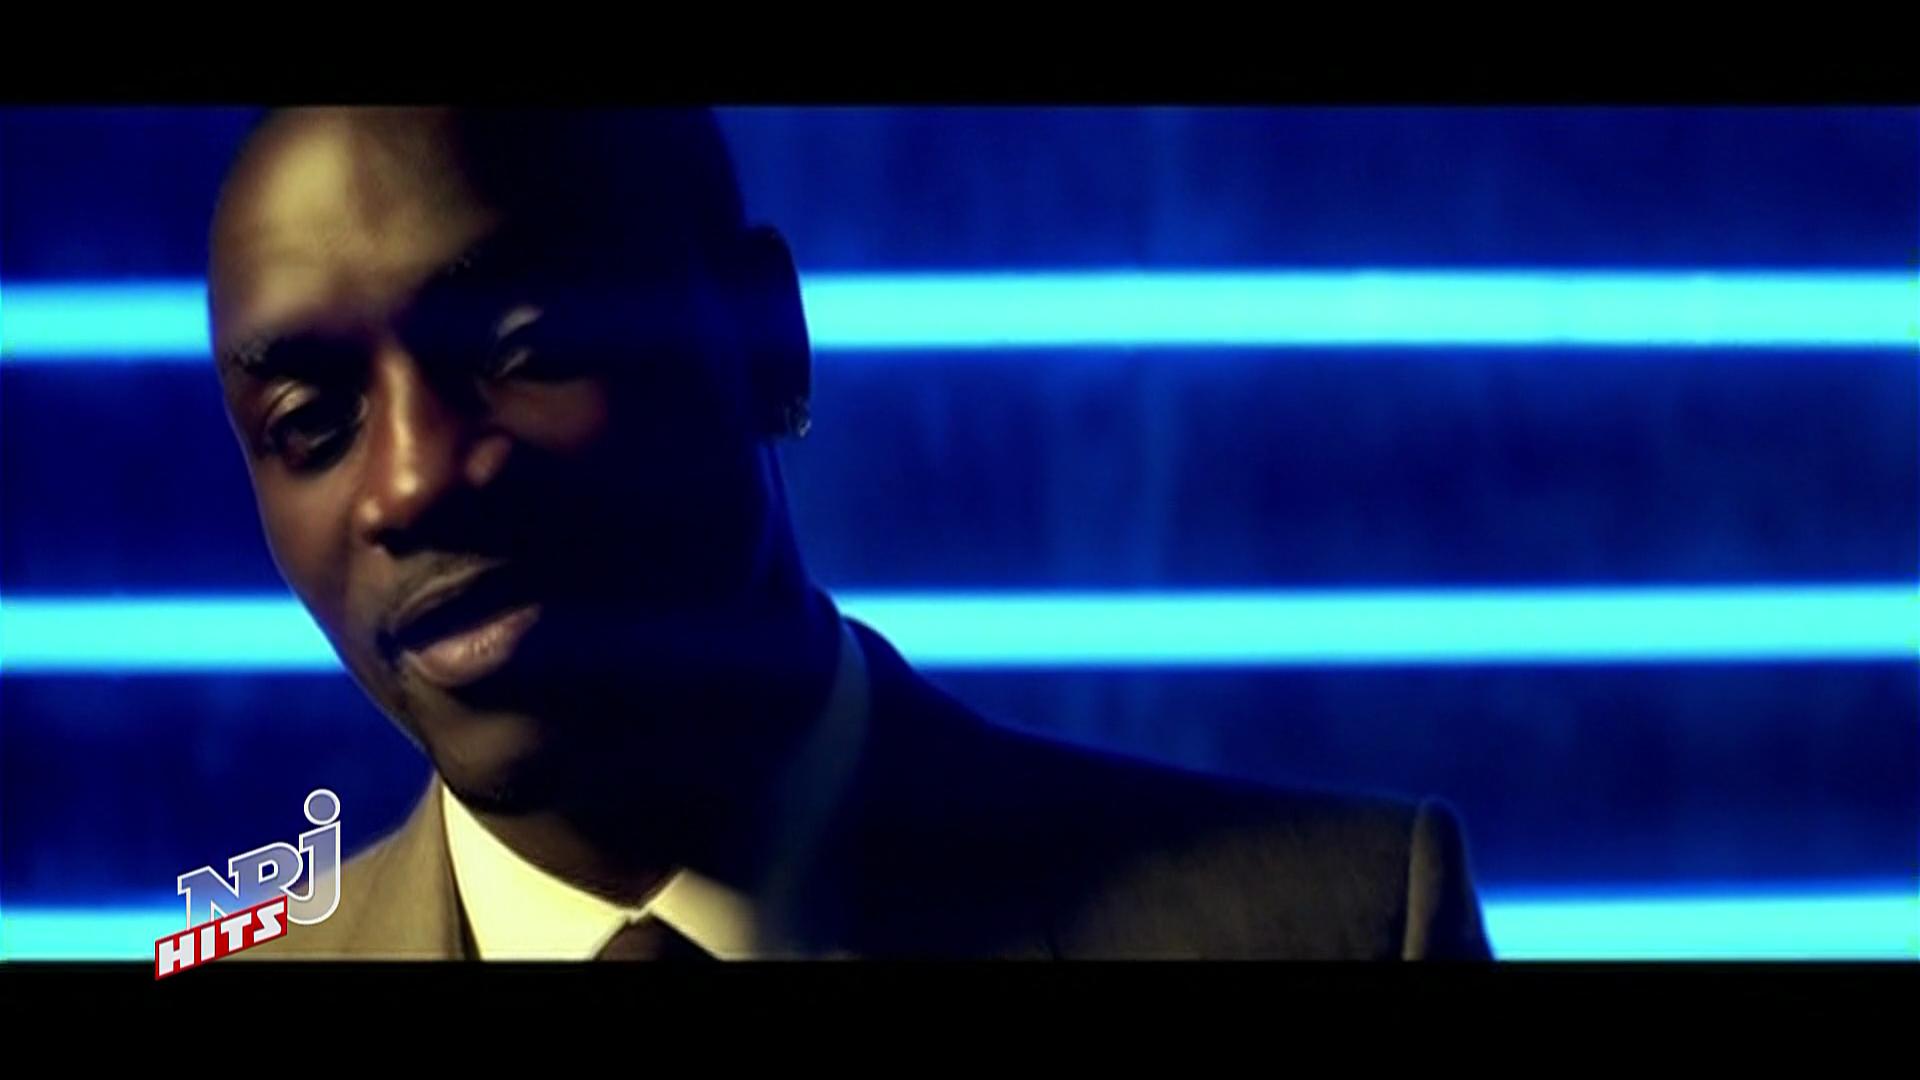 Akon - Right Now (Na Na Na) | (NRJHITSHD-1080i-AAC-IboYLDz)-HDMania